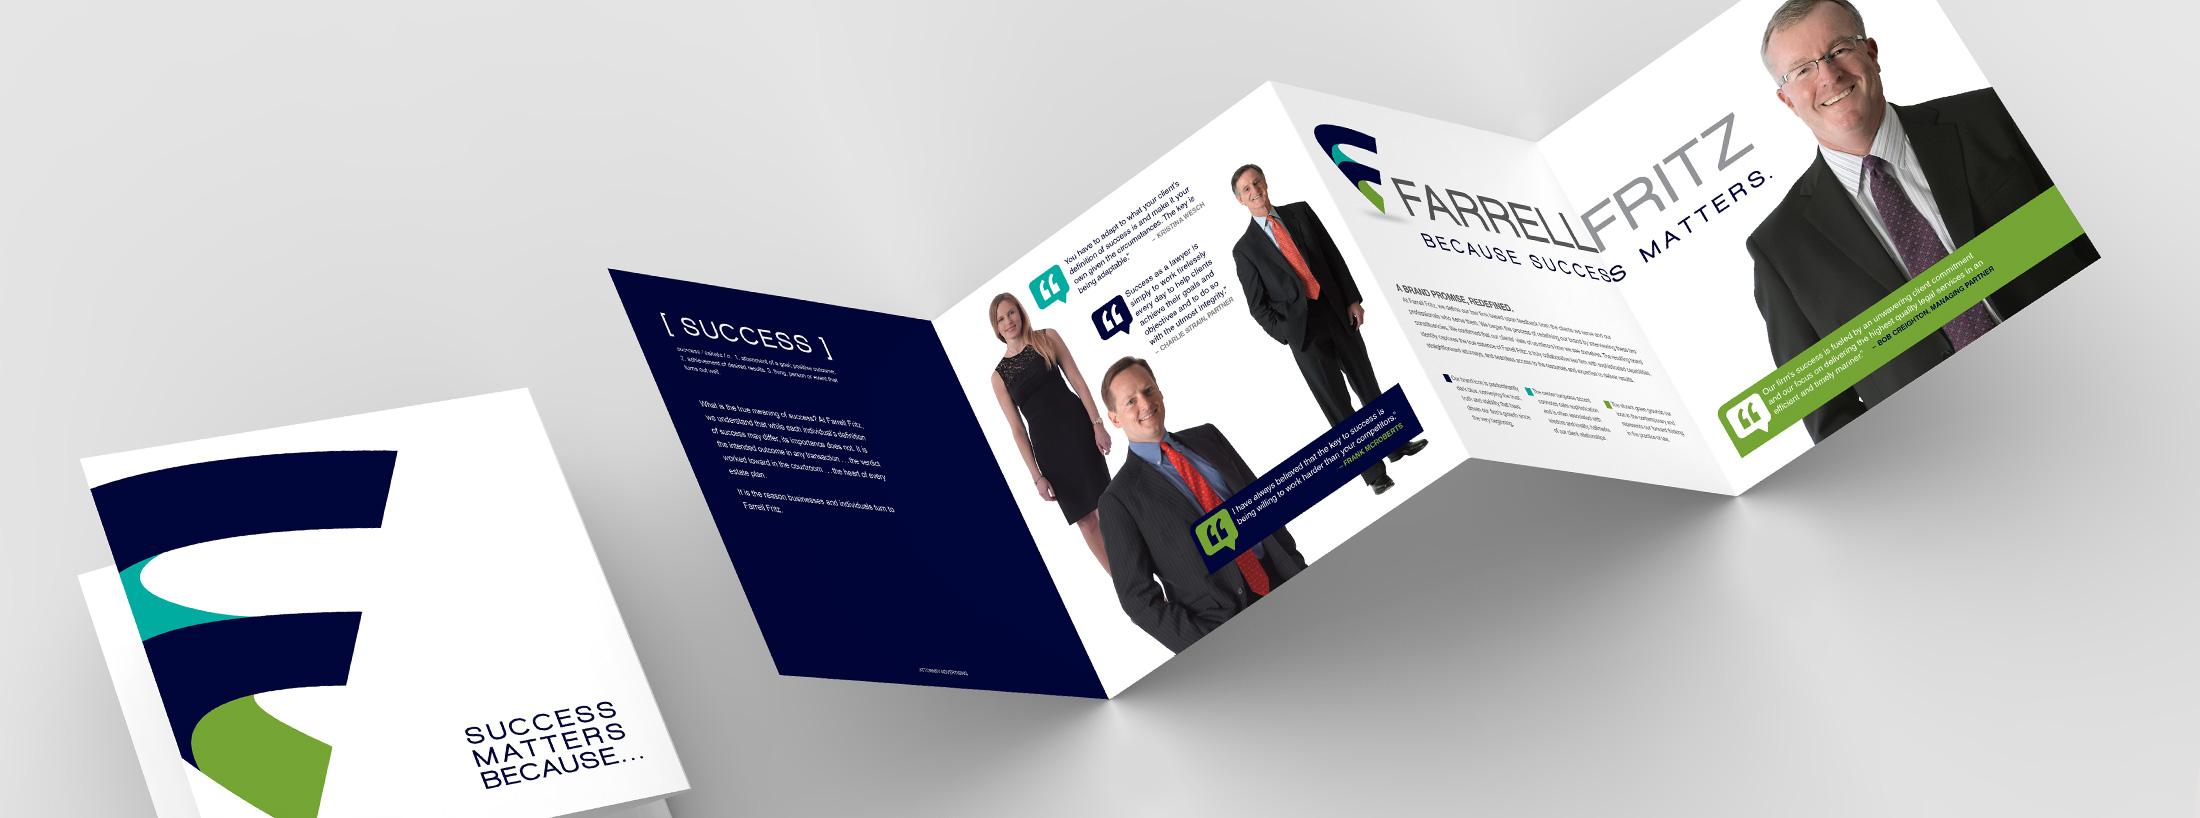 Farrell_2200x818_Case_Study_Full_Width_Brochure